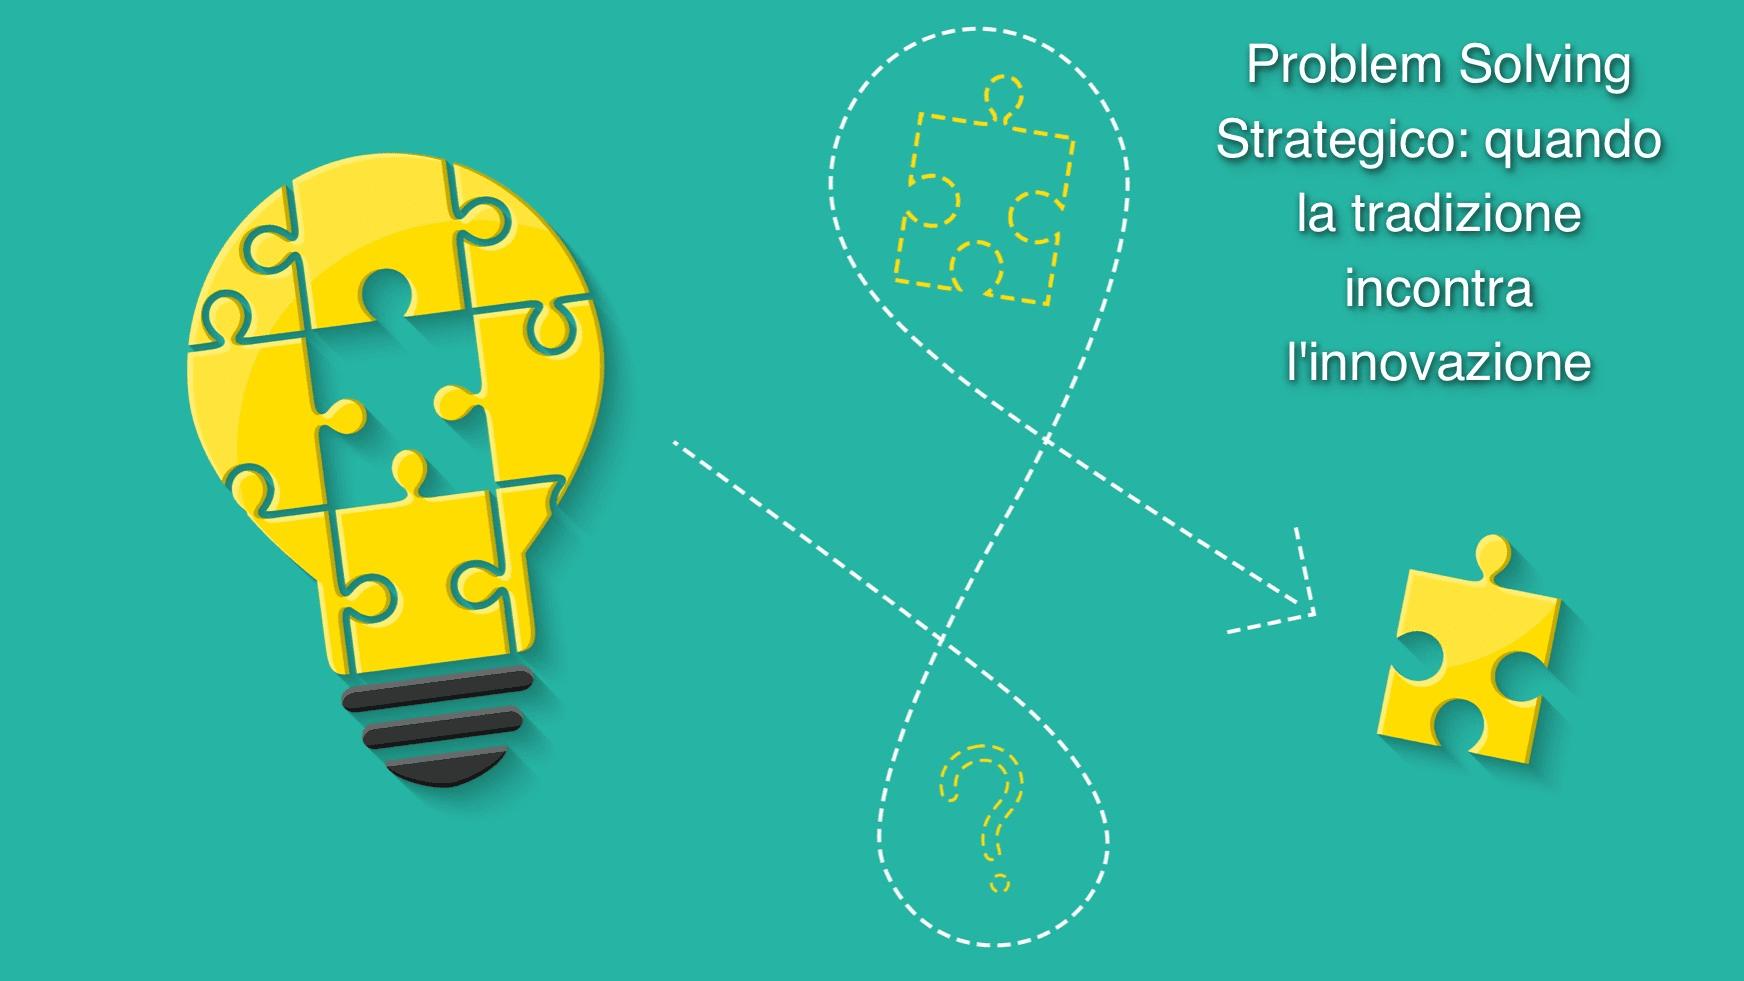 Problem solving strategico post (primavera 2017)